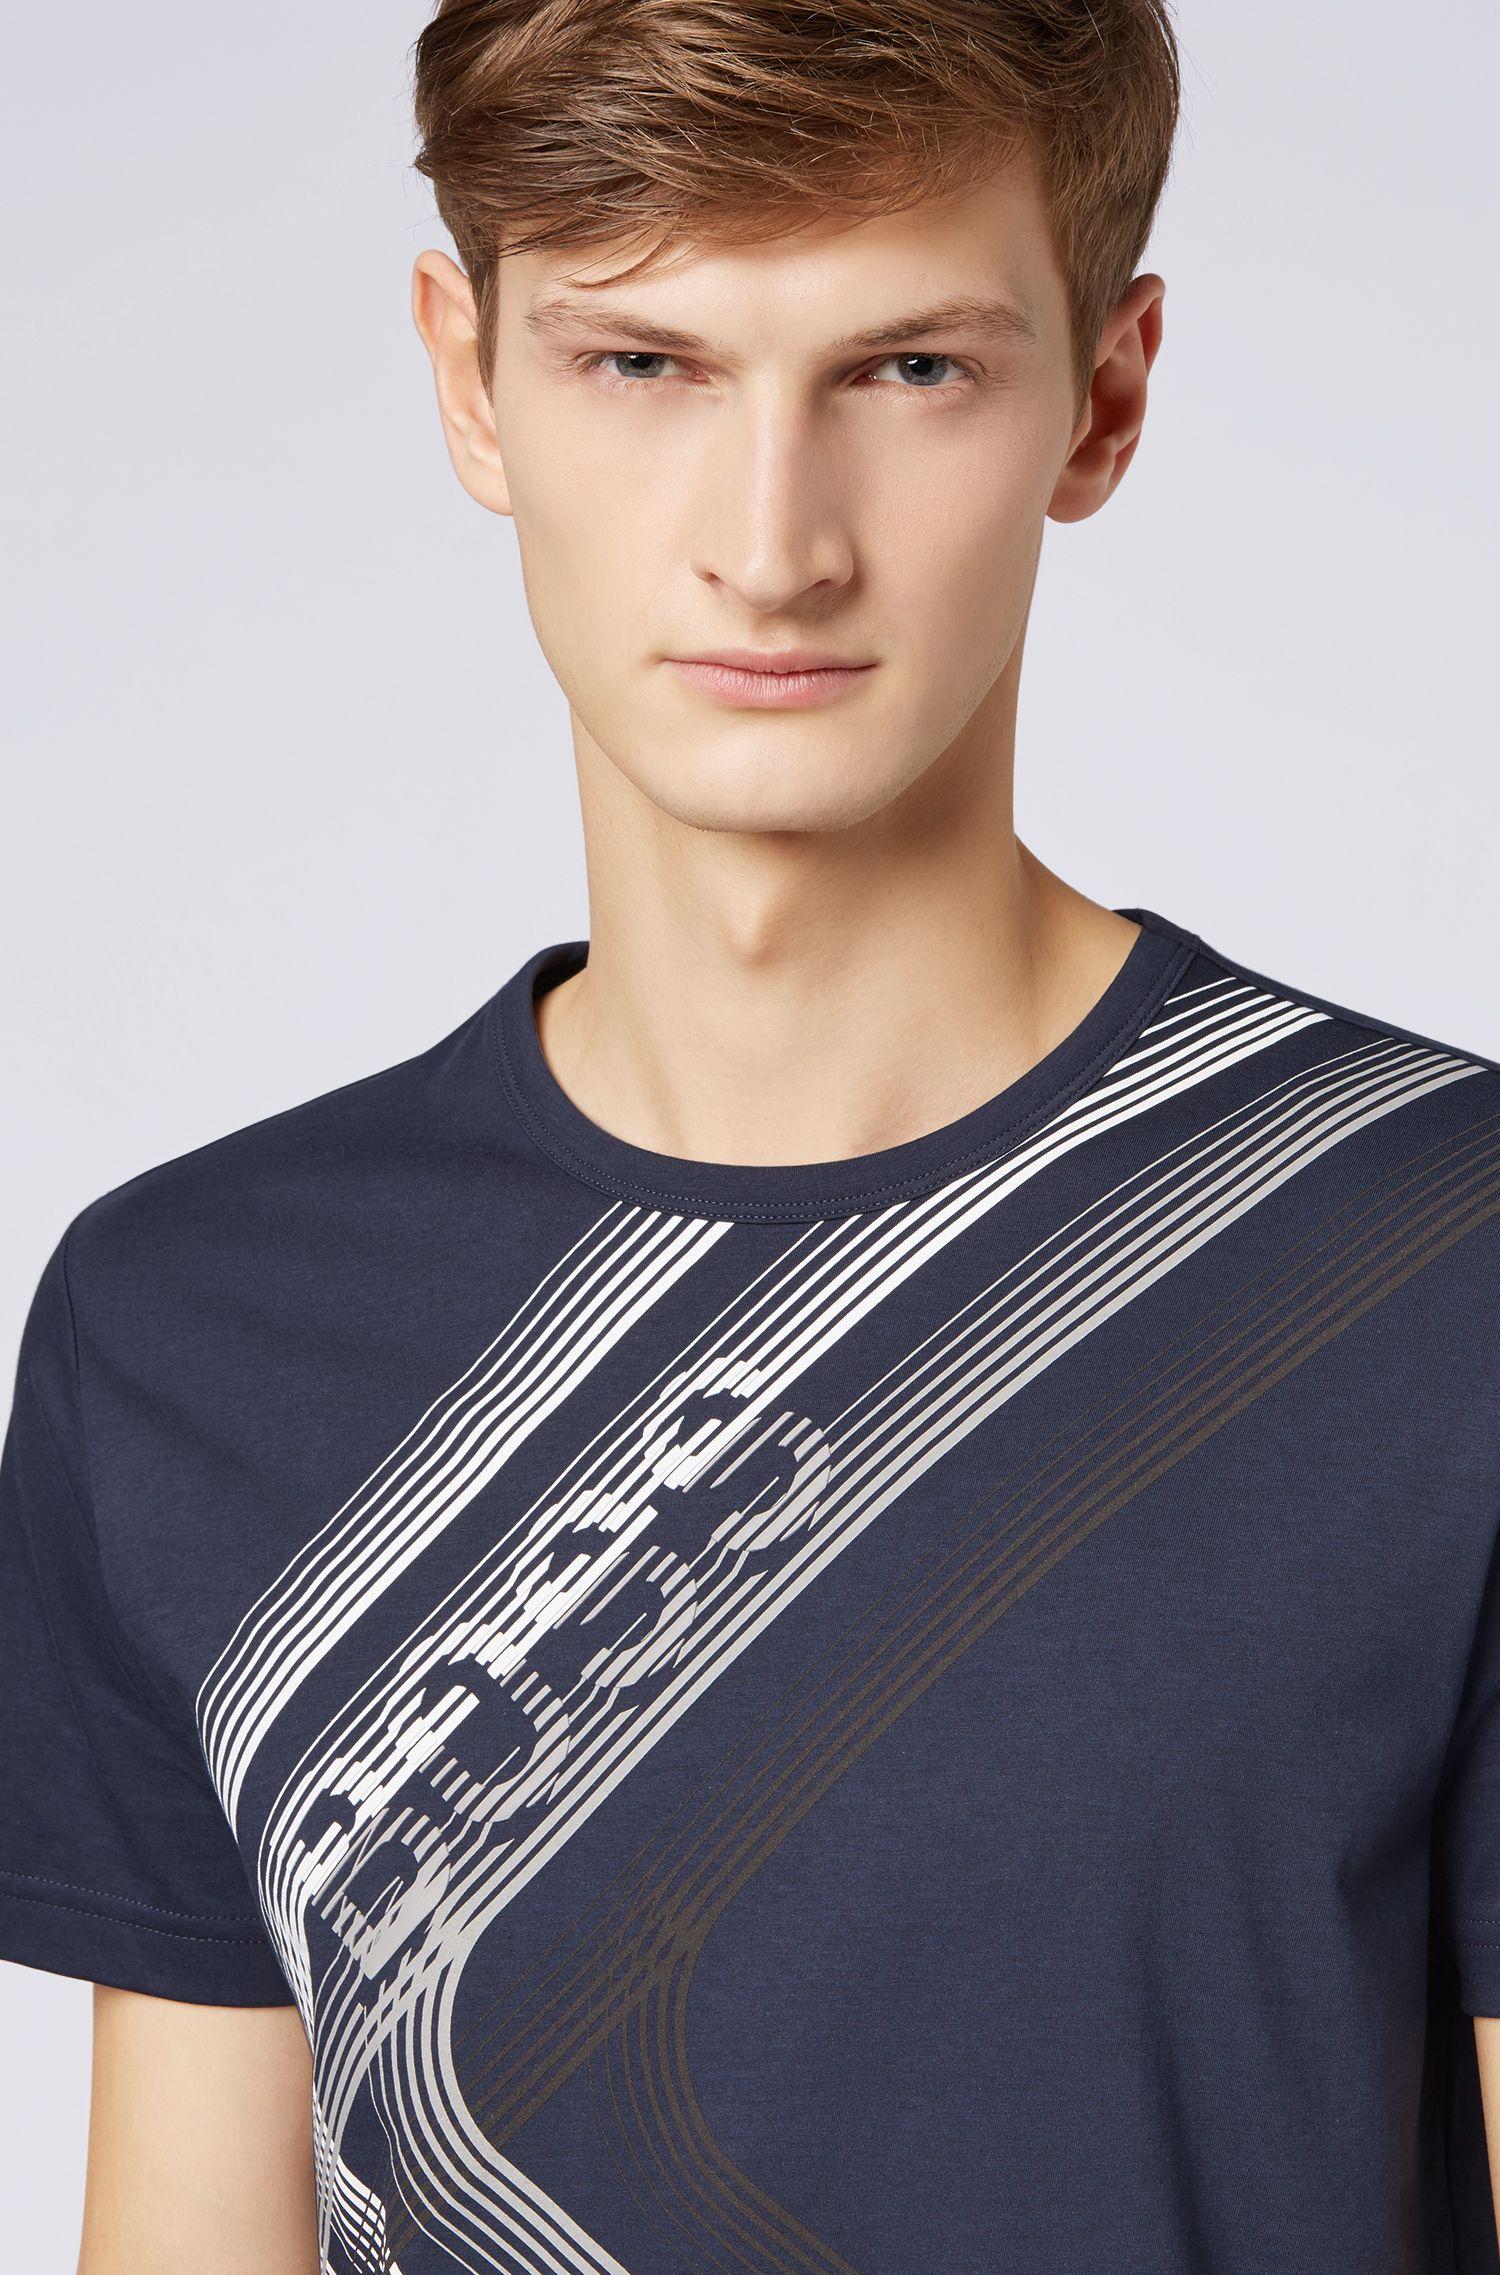 Camiseta regular fit con ilustración de logo en punto de algodón, Azul oscuro